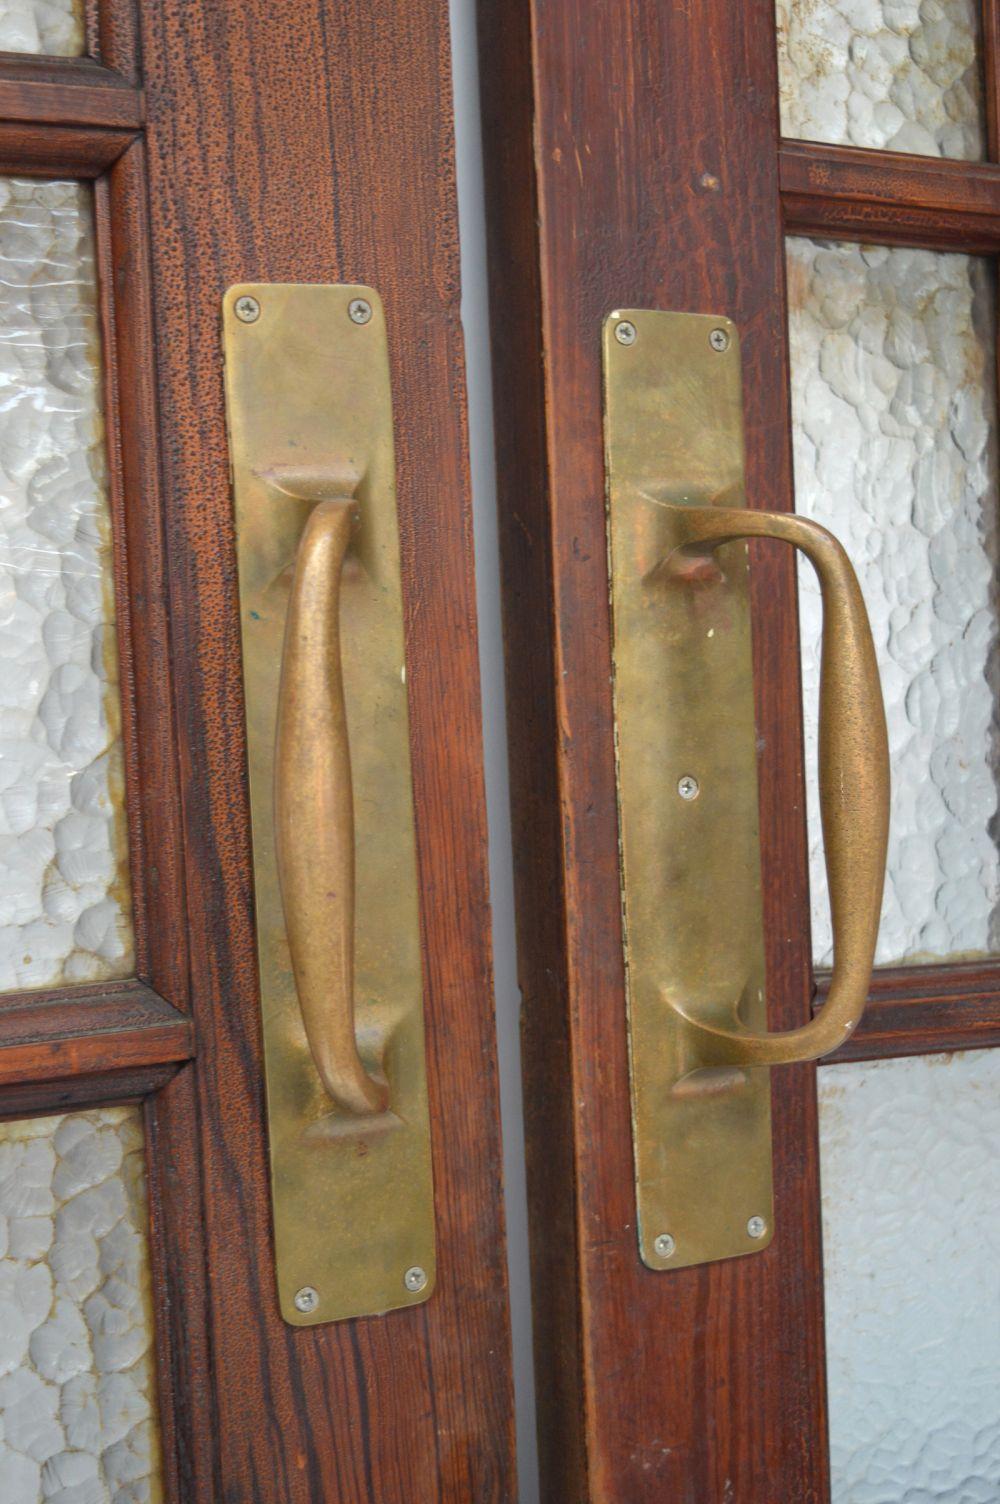 19TH-CENTURY SCUMBEL PITCH PINE SALOON DOORS - Image 2 of 3